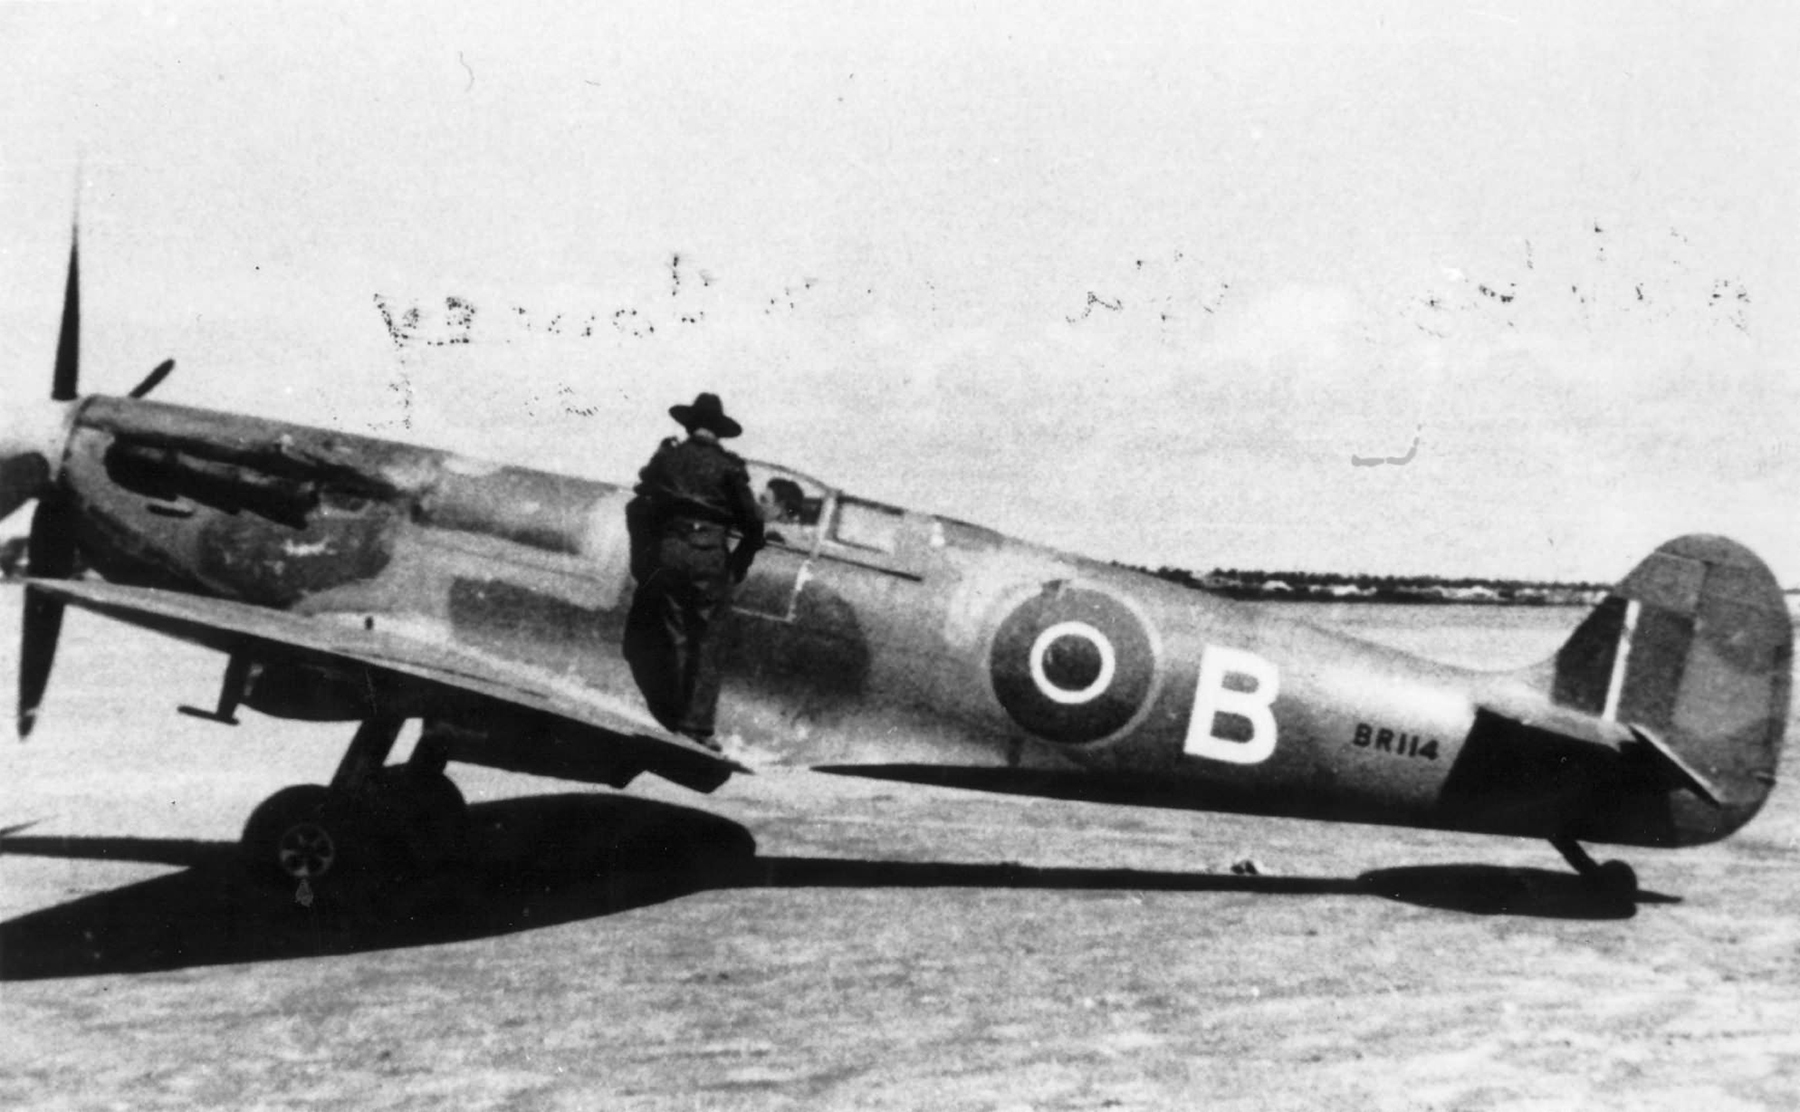 Spitfire MkVc RAF 103 Maintenance Unit BR114 in Aboukir Eygpt 1943 web 01